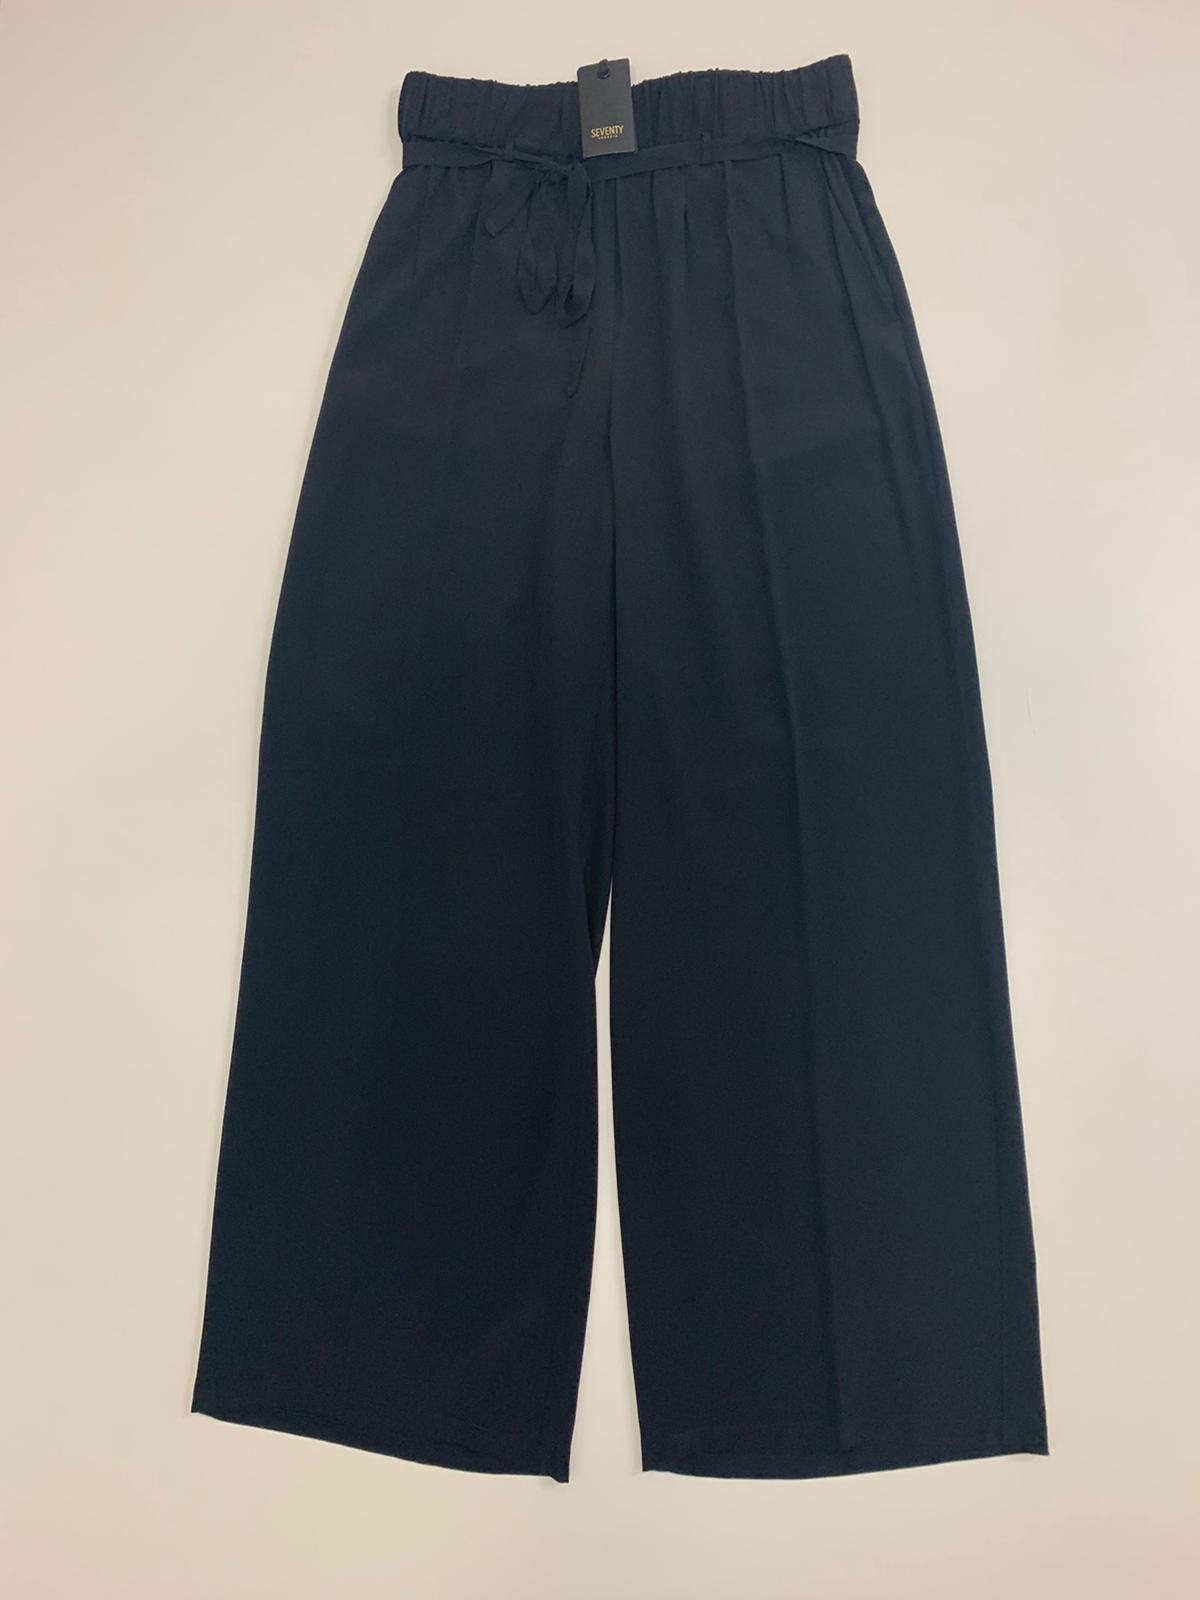 Pantalone Seventy Crepe Nera